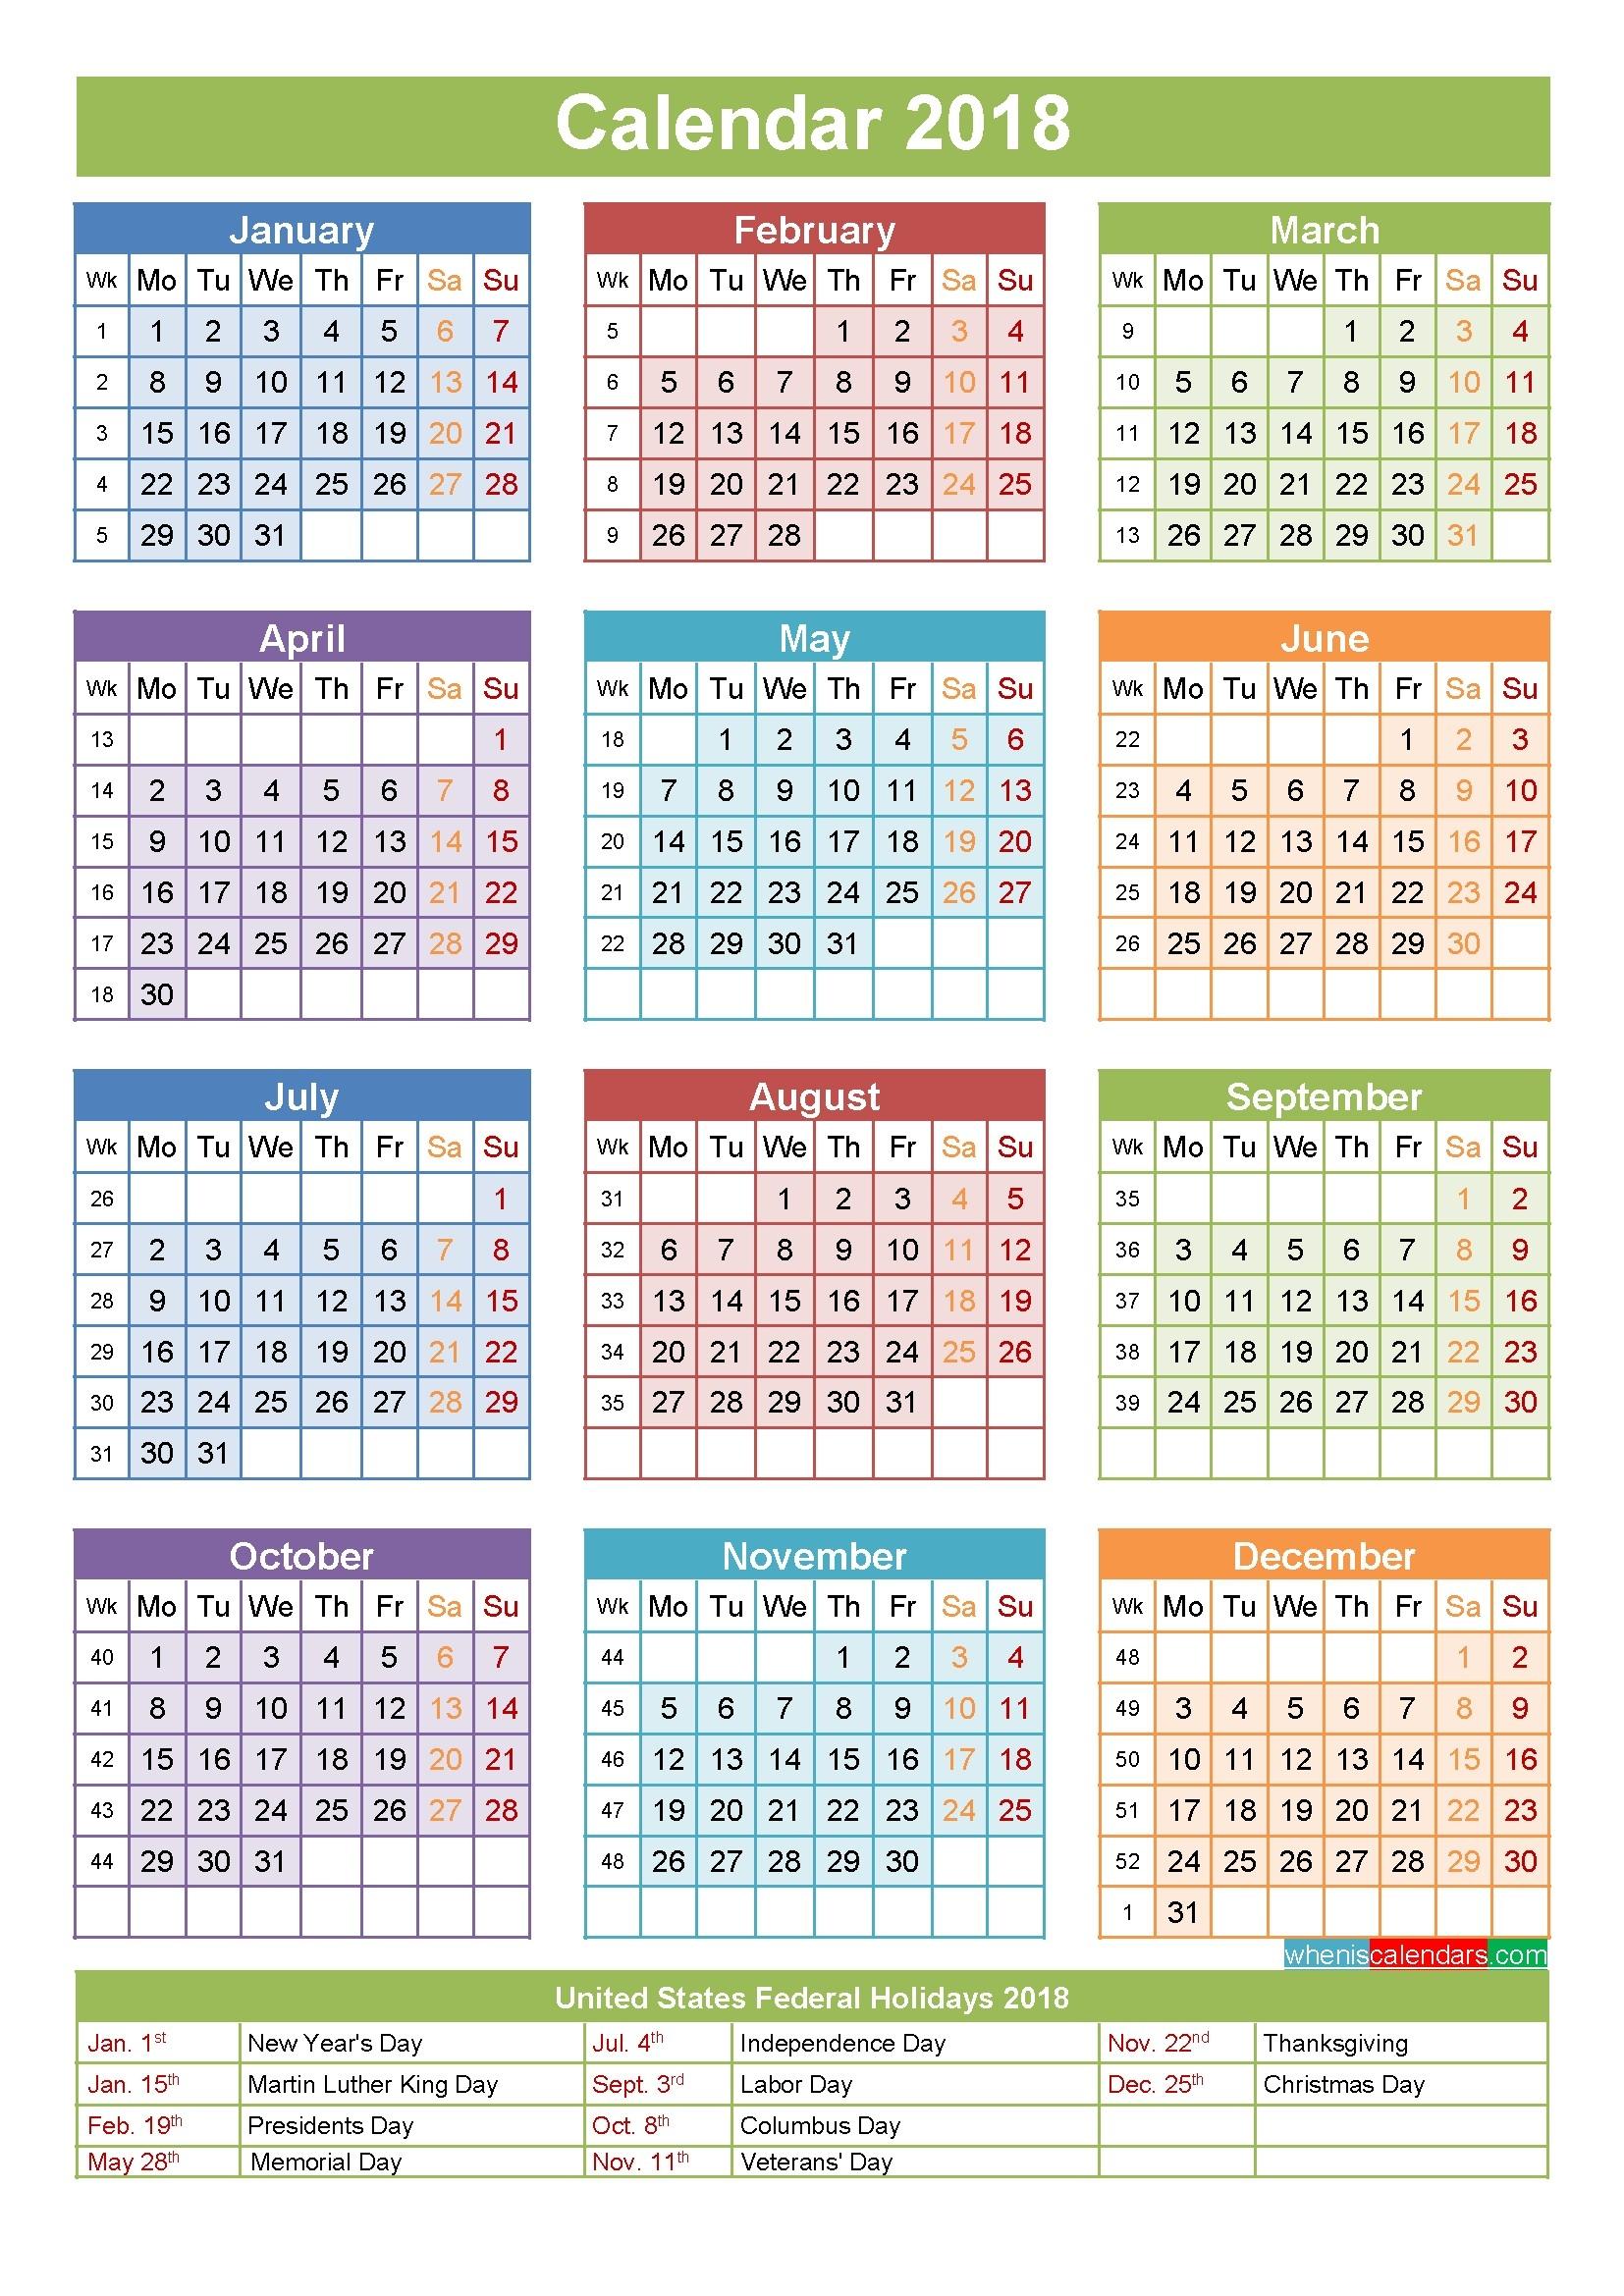 2 2019 2018 Hindu Panchang Calendar | Calendar Template